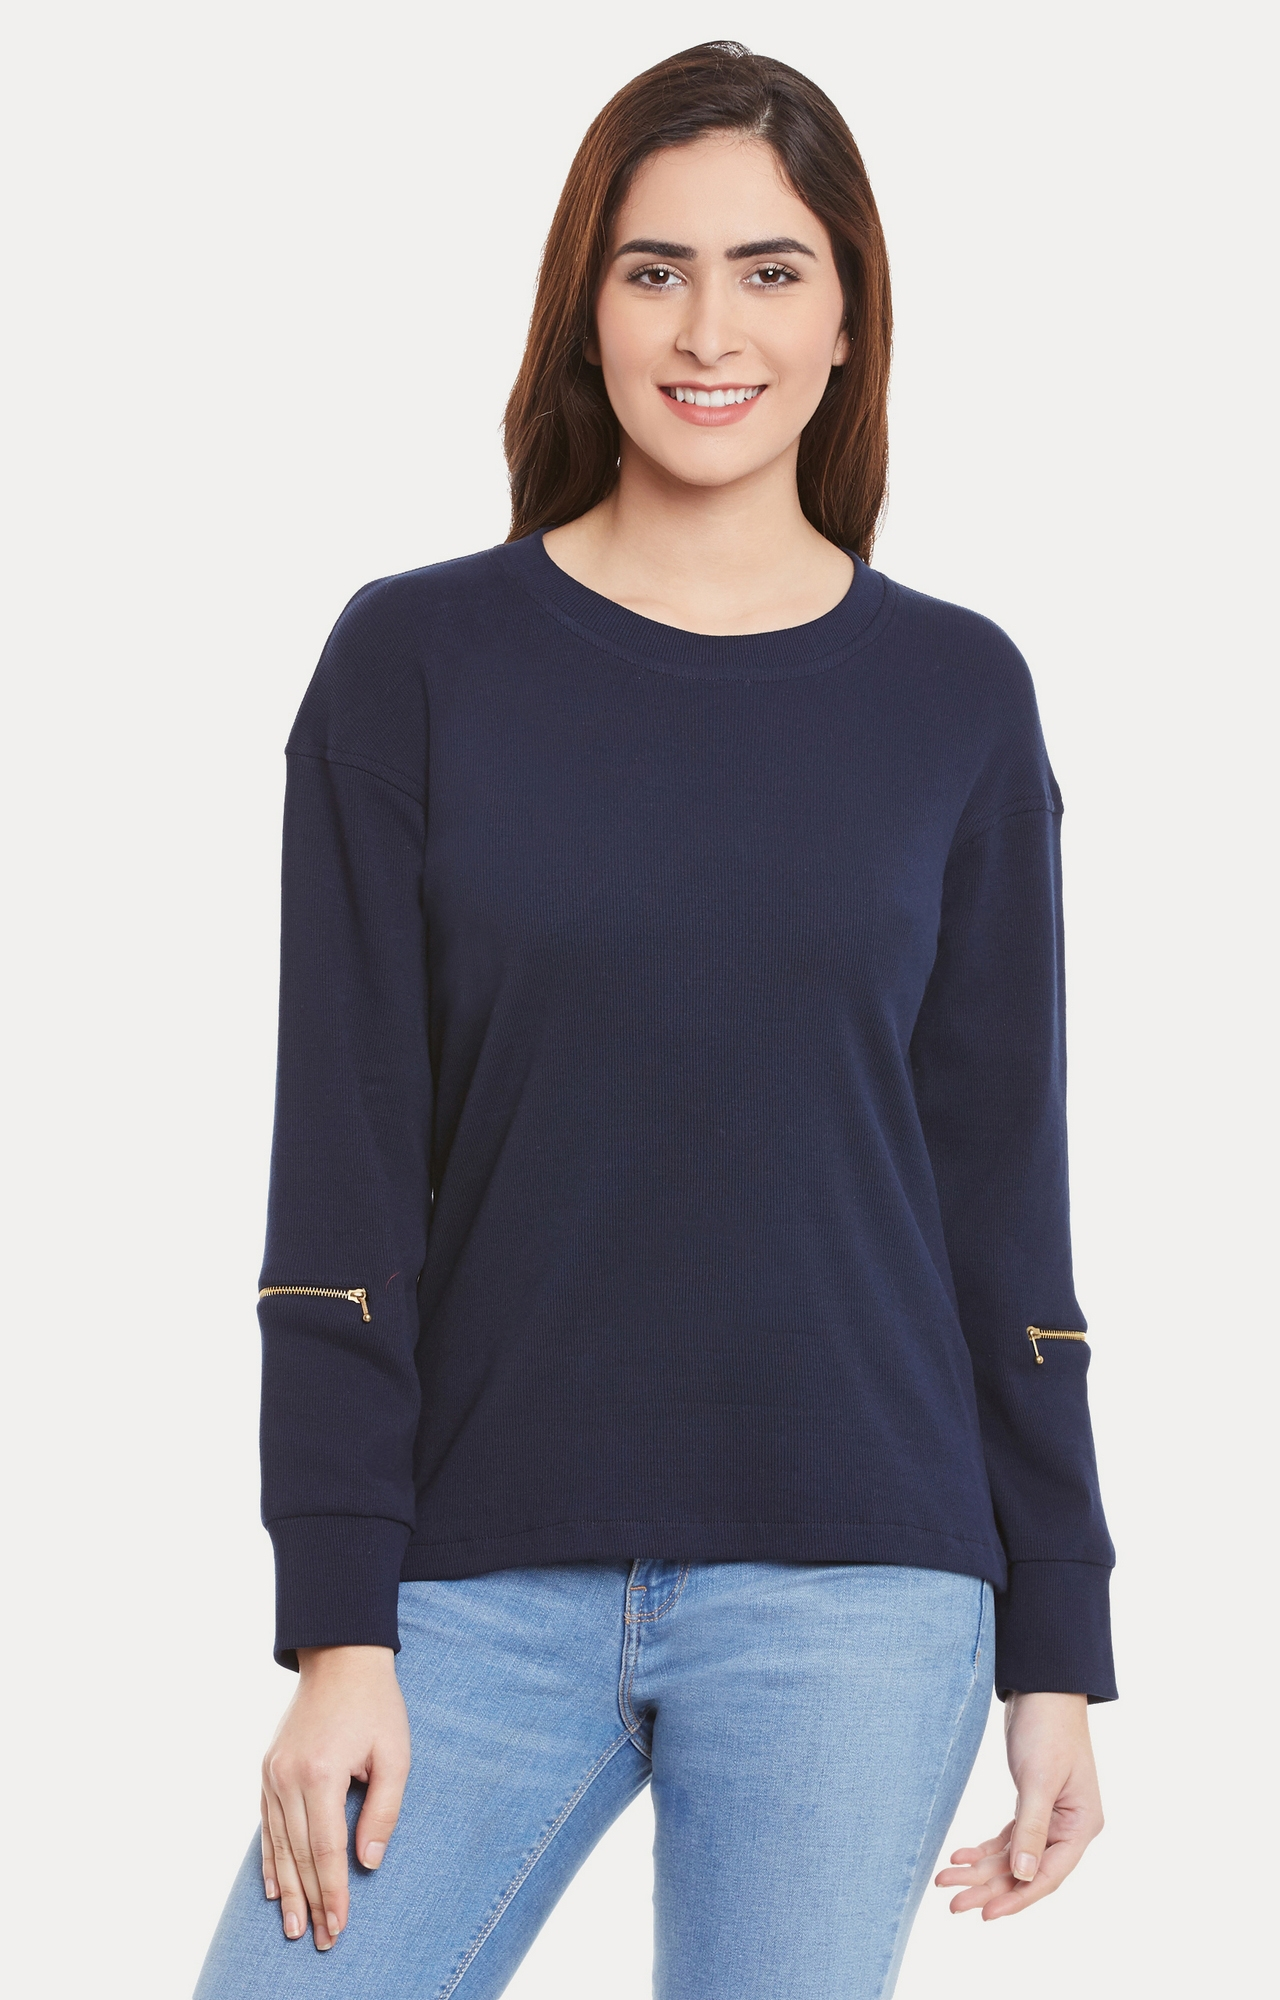 MISS CHASE | Navy Blue Sweatshirt